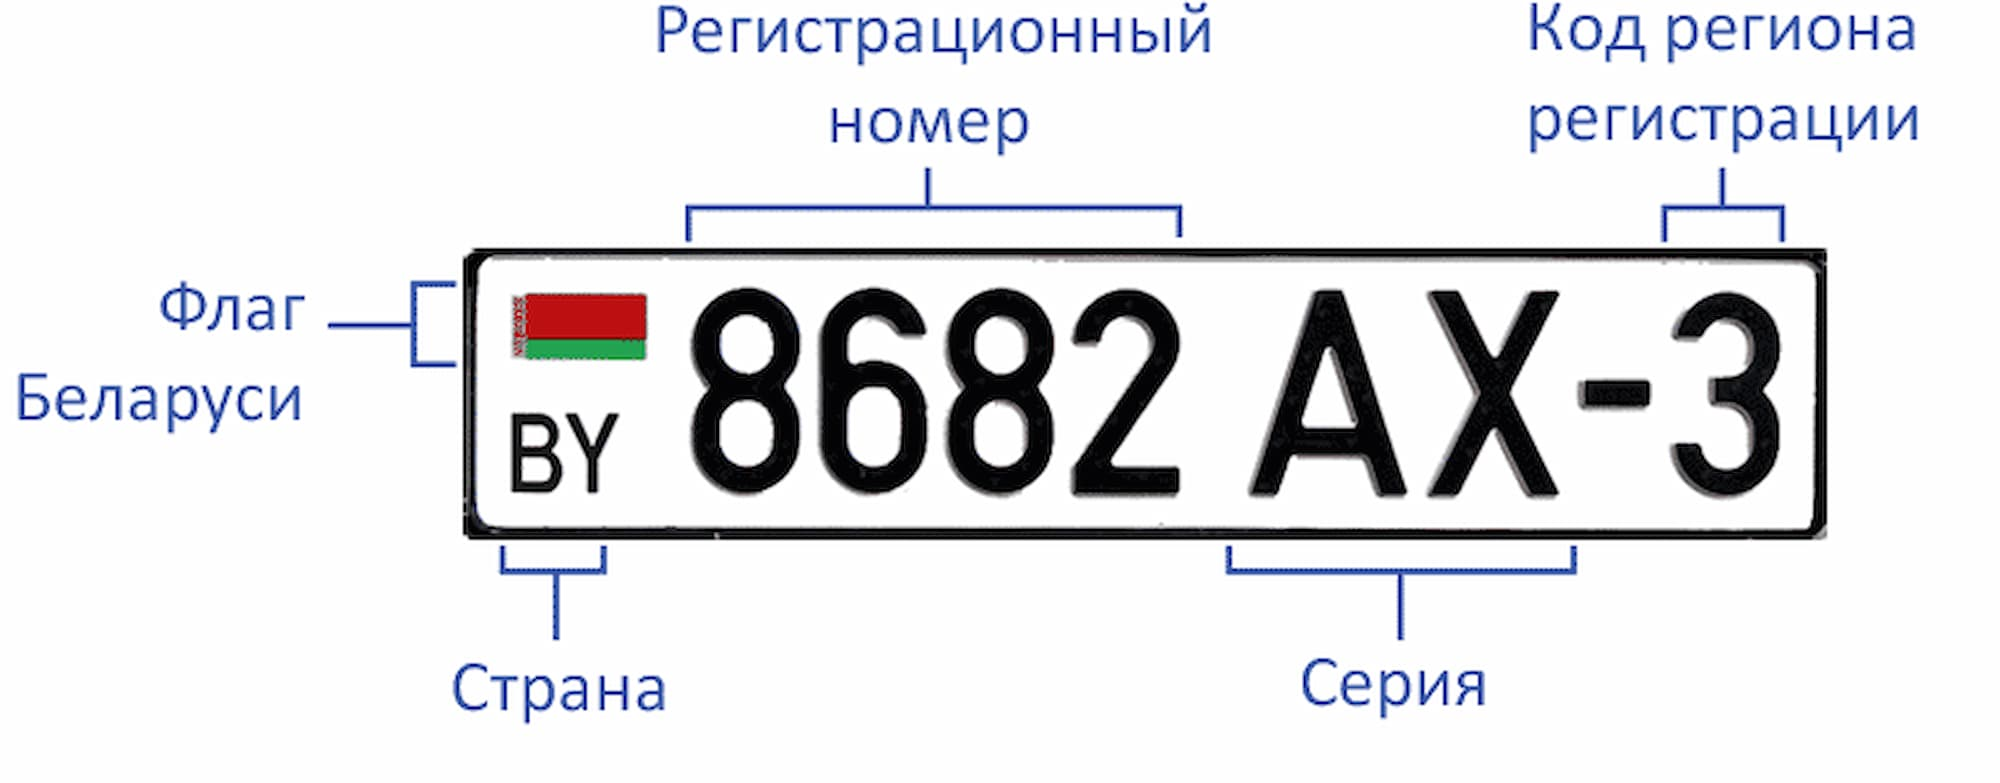 avto nomer belarus